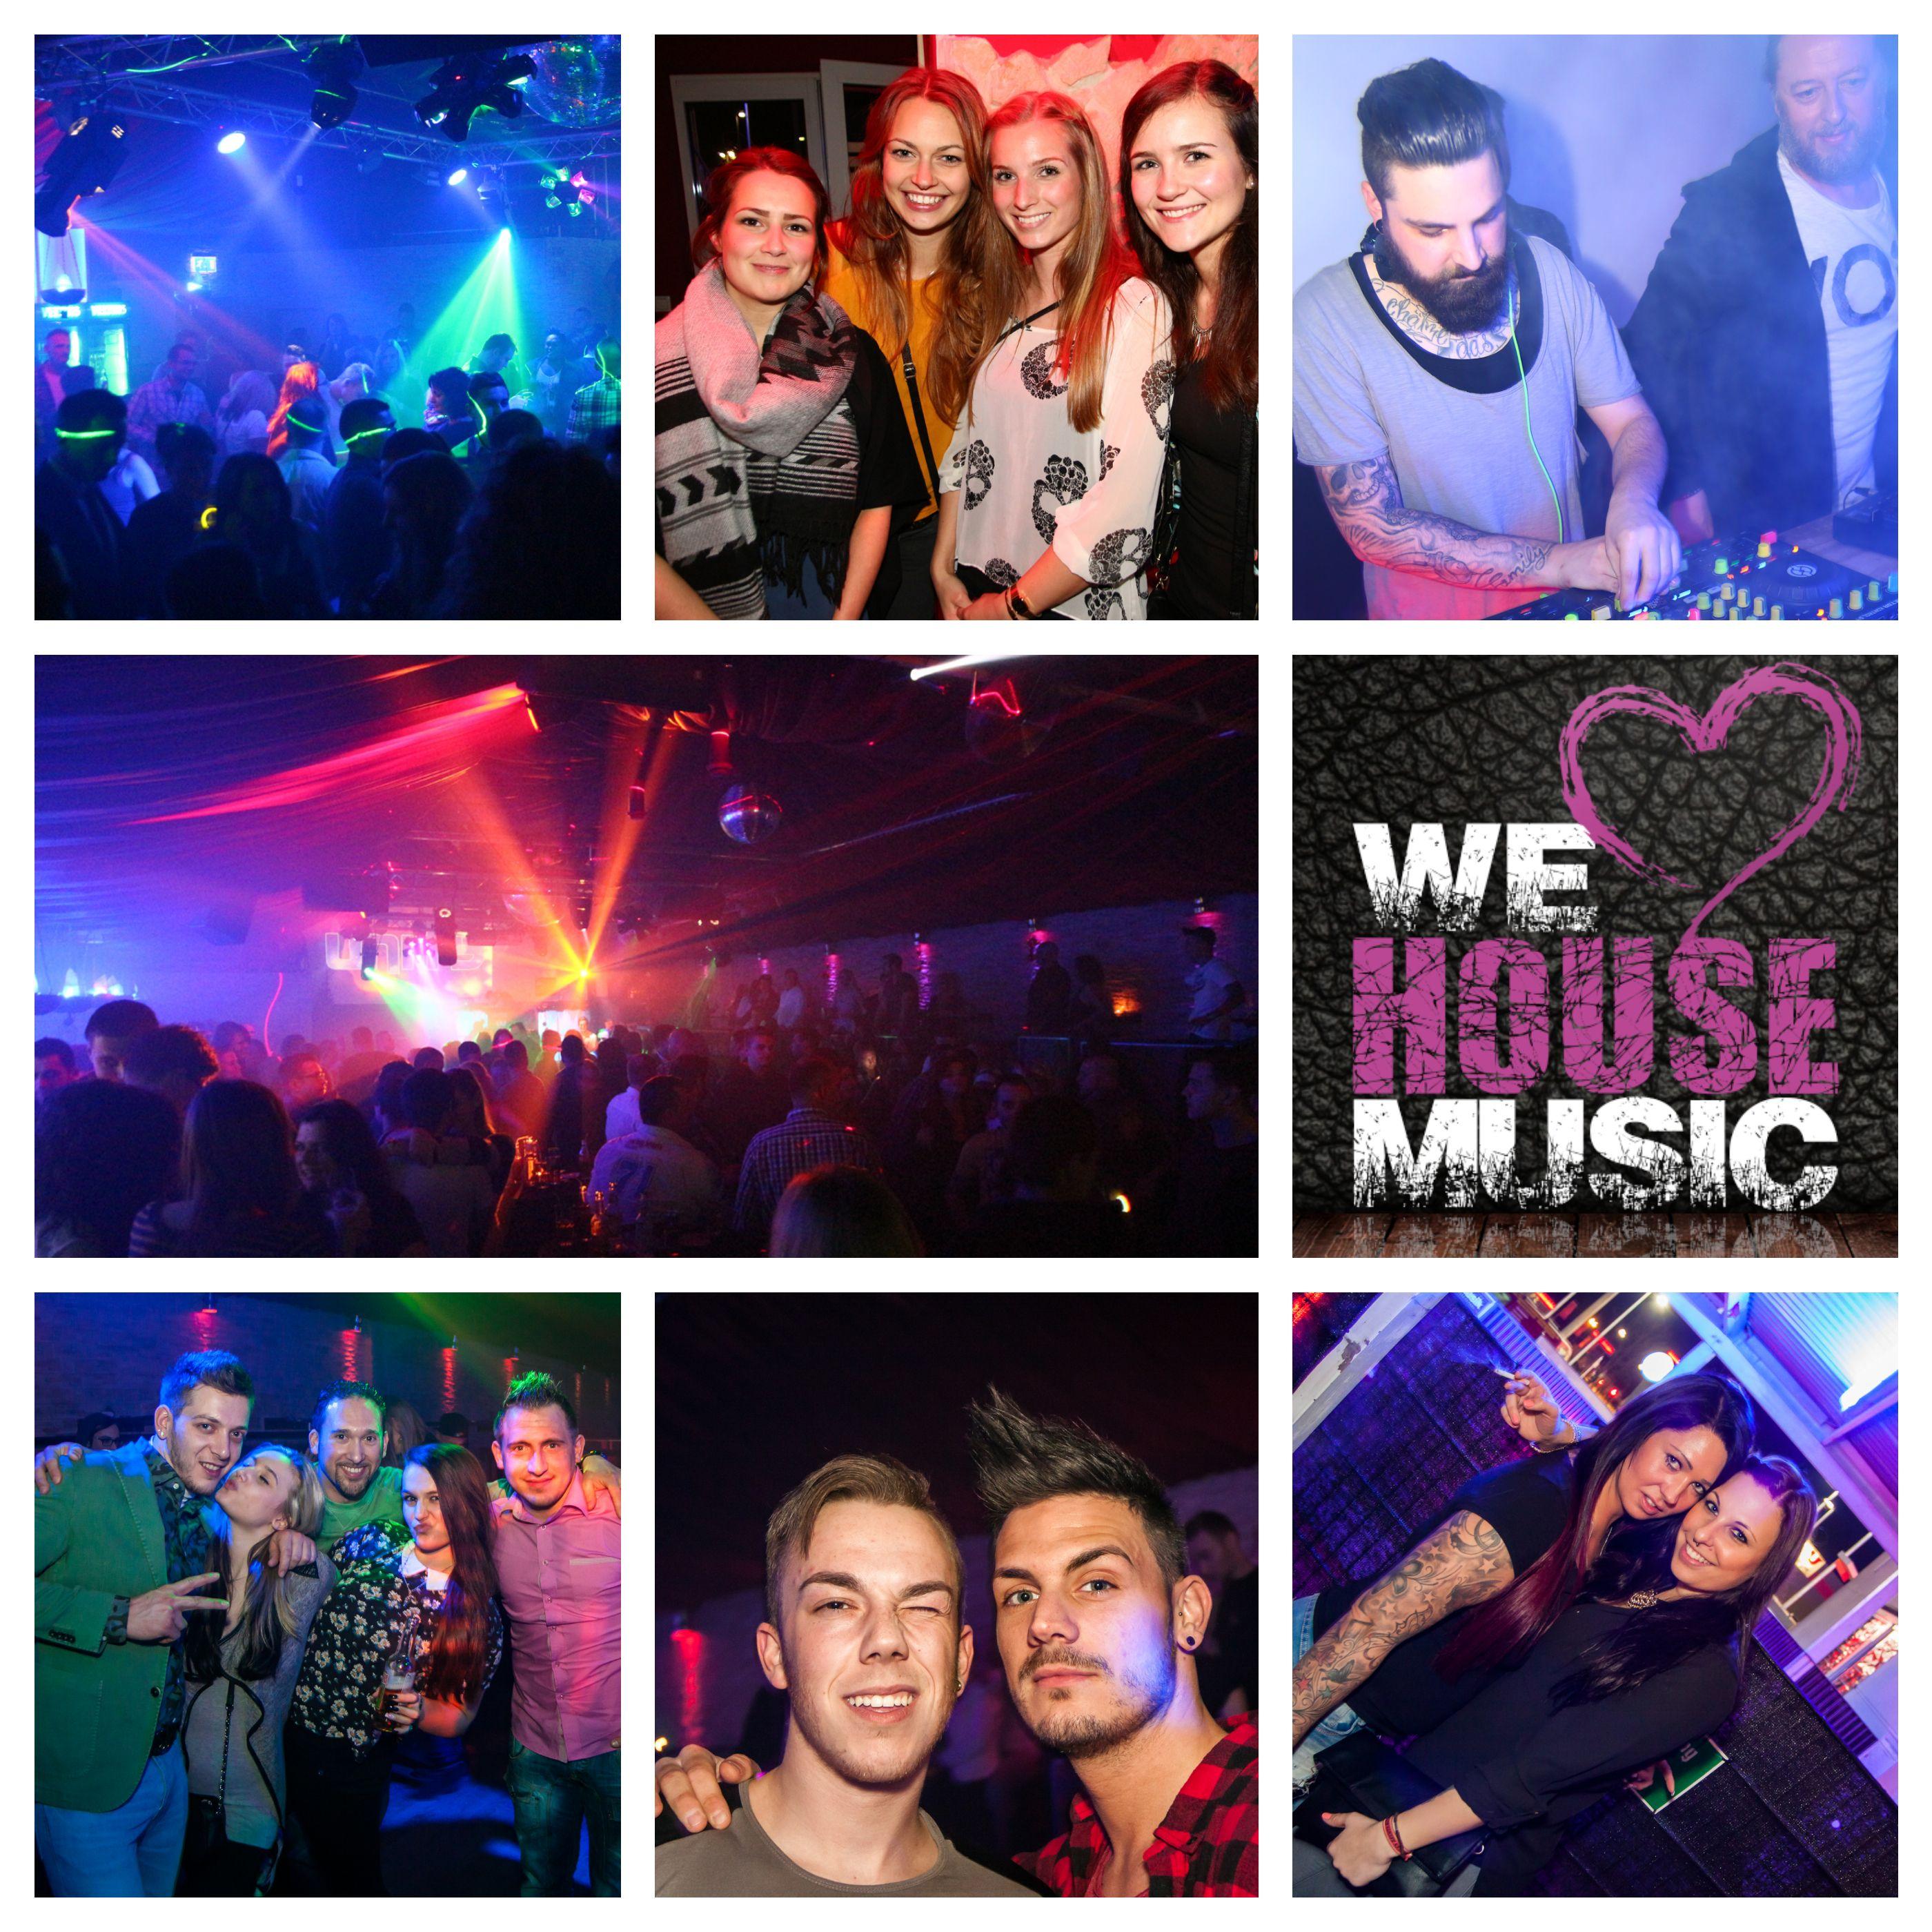 FREITAG ! ! ! ! 29.05.15 We Love House Music @ Musik Langenfeld mit UniTy // Rene Petti // Ben Bizarre